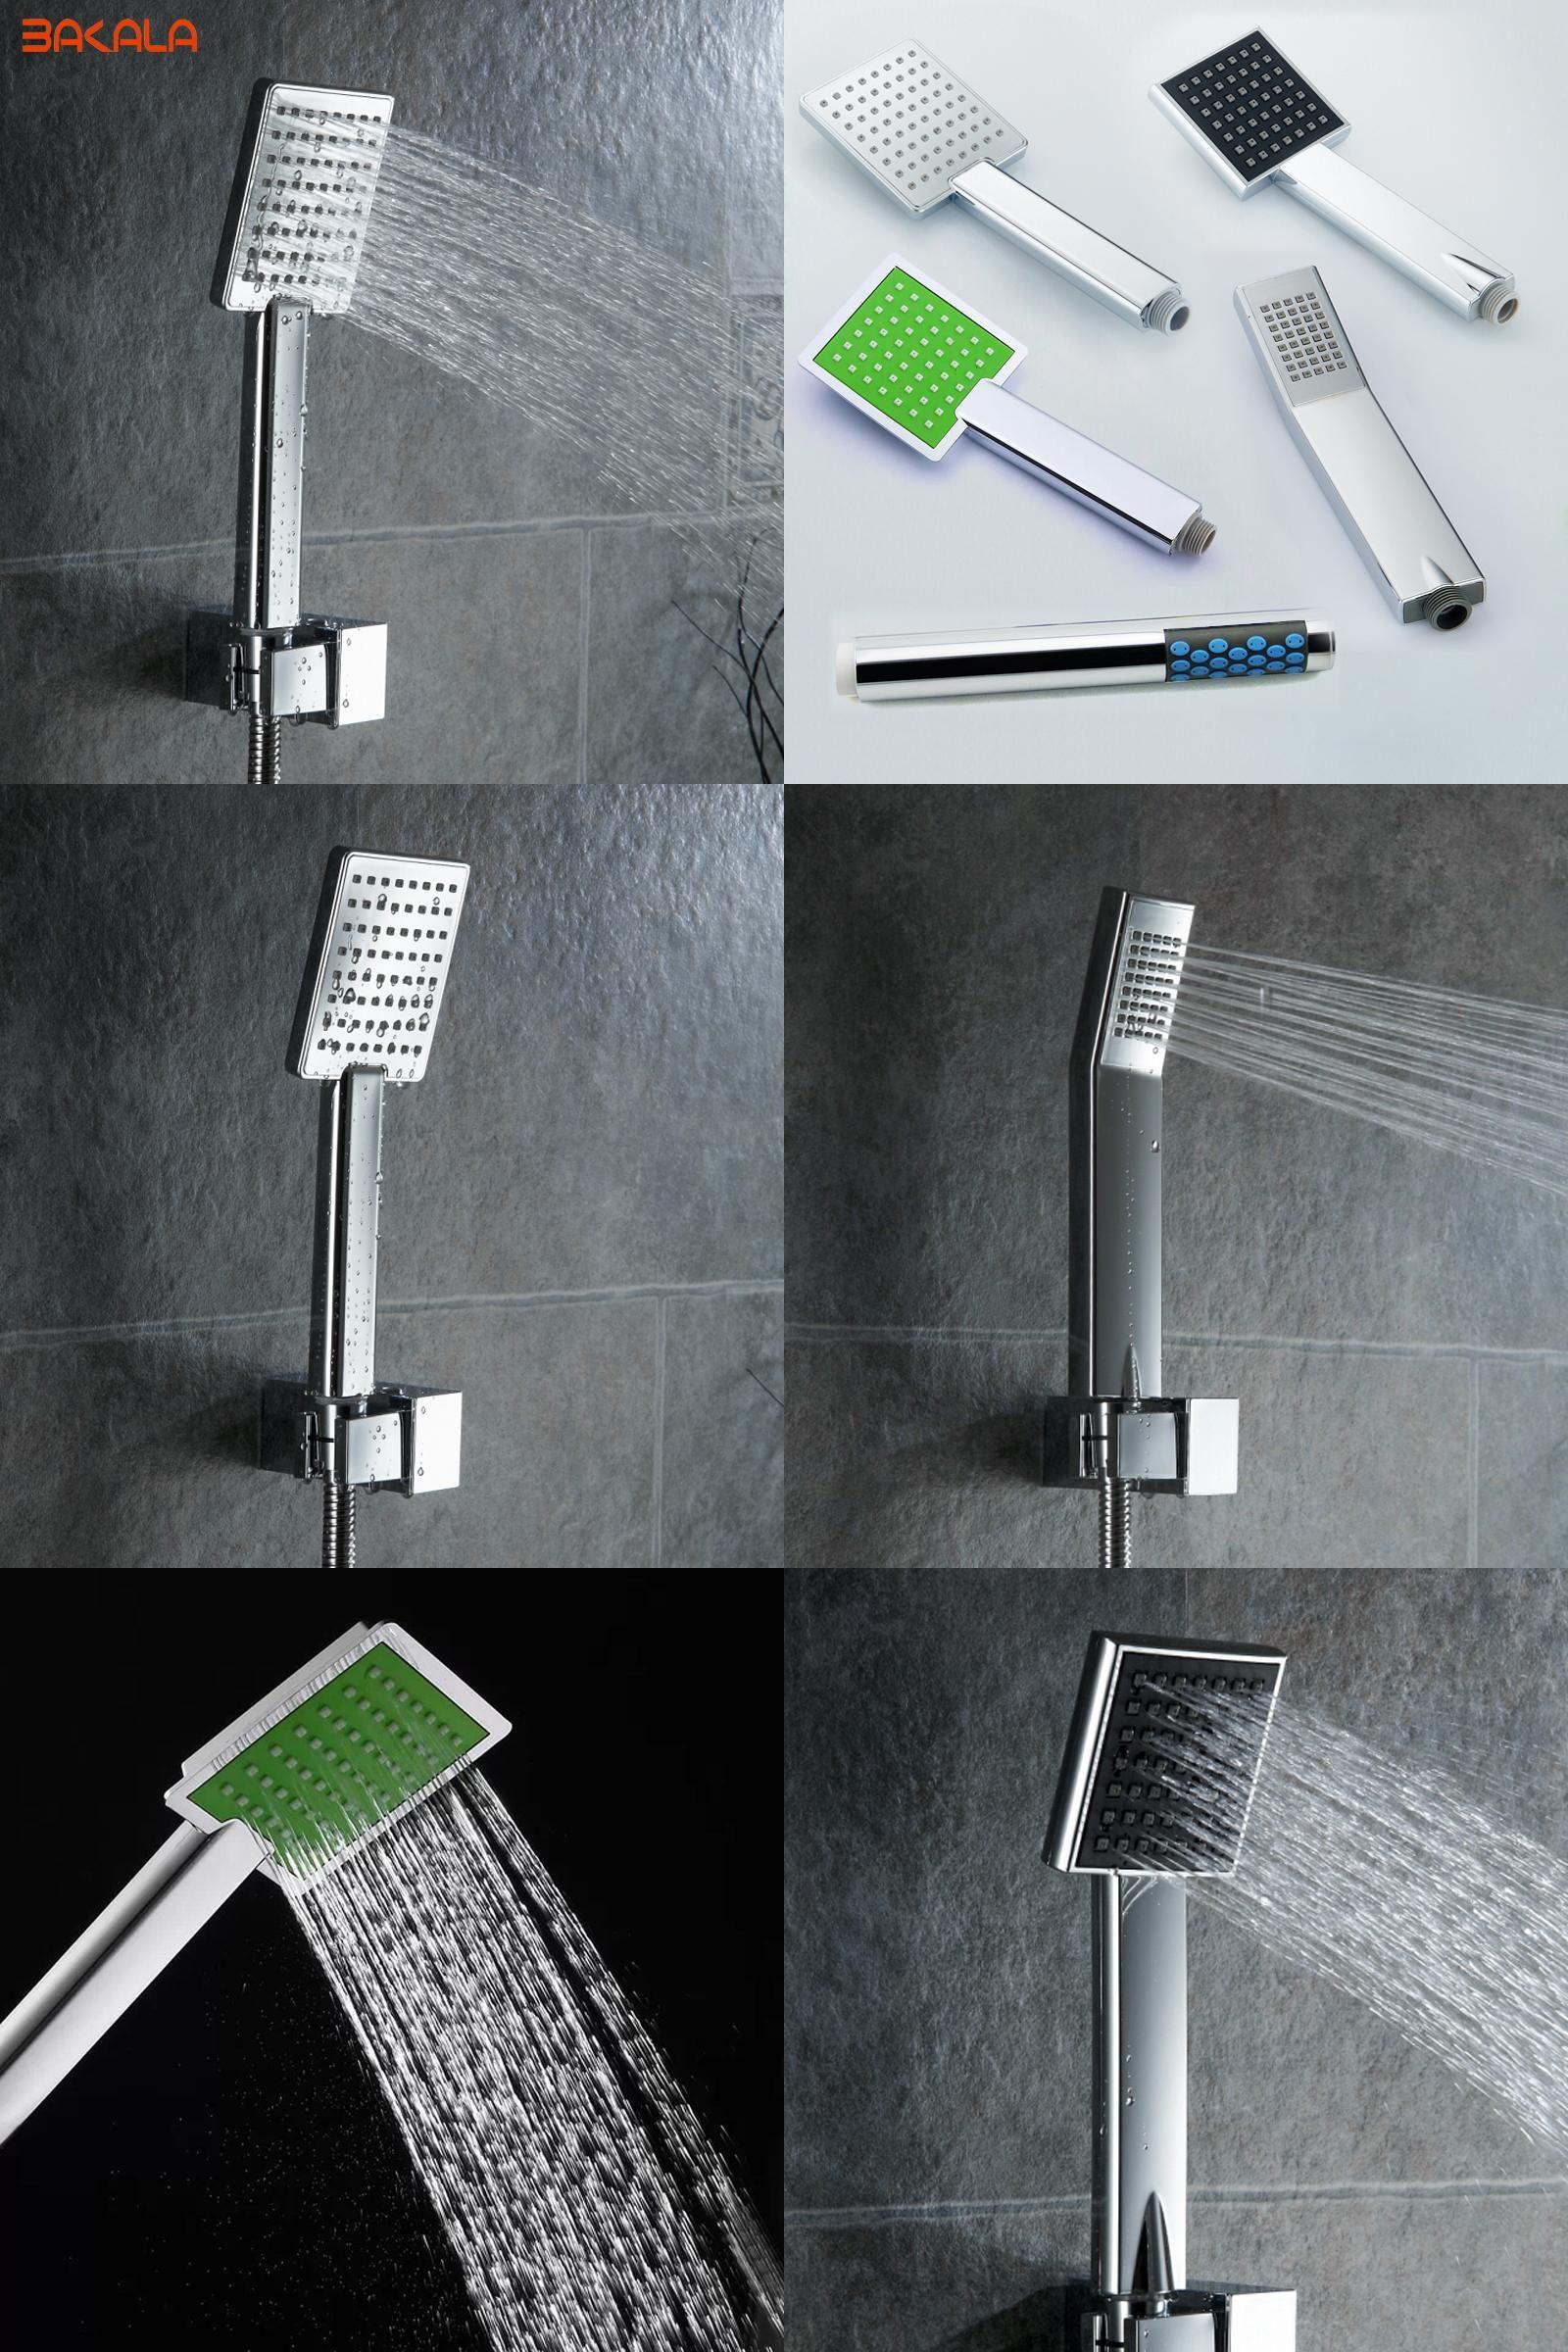 Visit To Buy Bakala Abs Handheld Shower Head Bathroom Showerhead